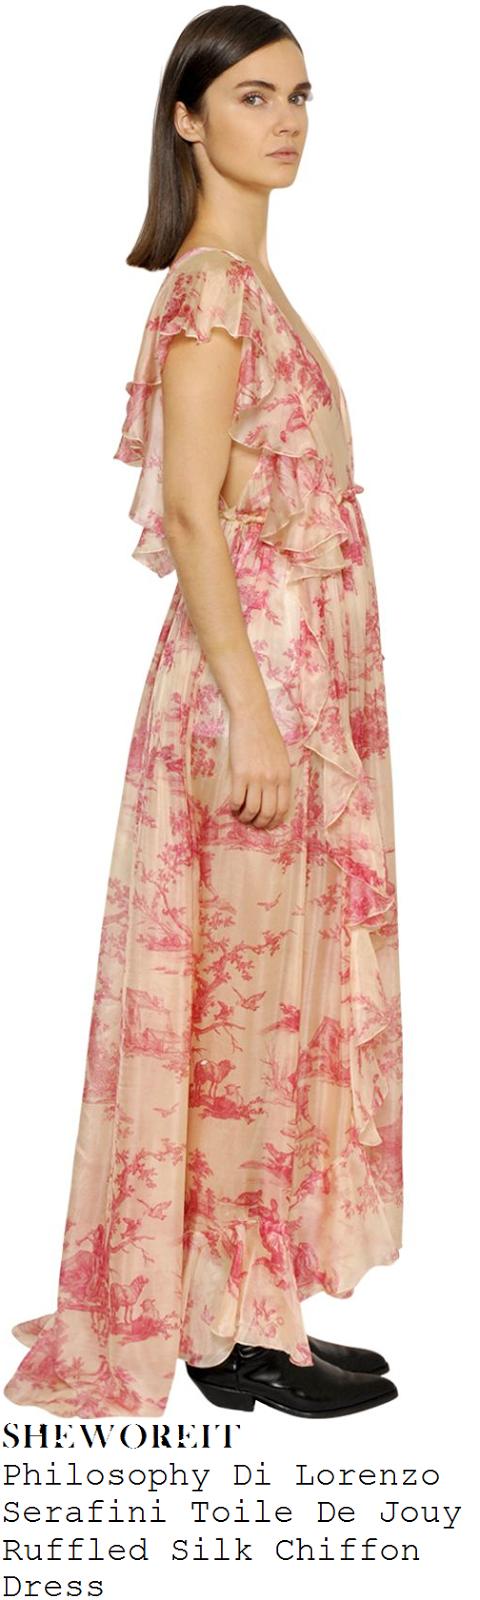 danielle-bux-philosophy-di-lorenzo-serafini-toile-de-jouy-cream-and-pink-ruffle-silk-maxi-dress